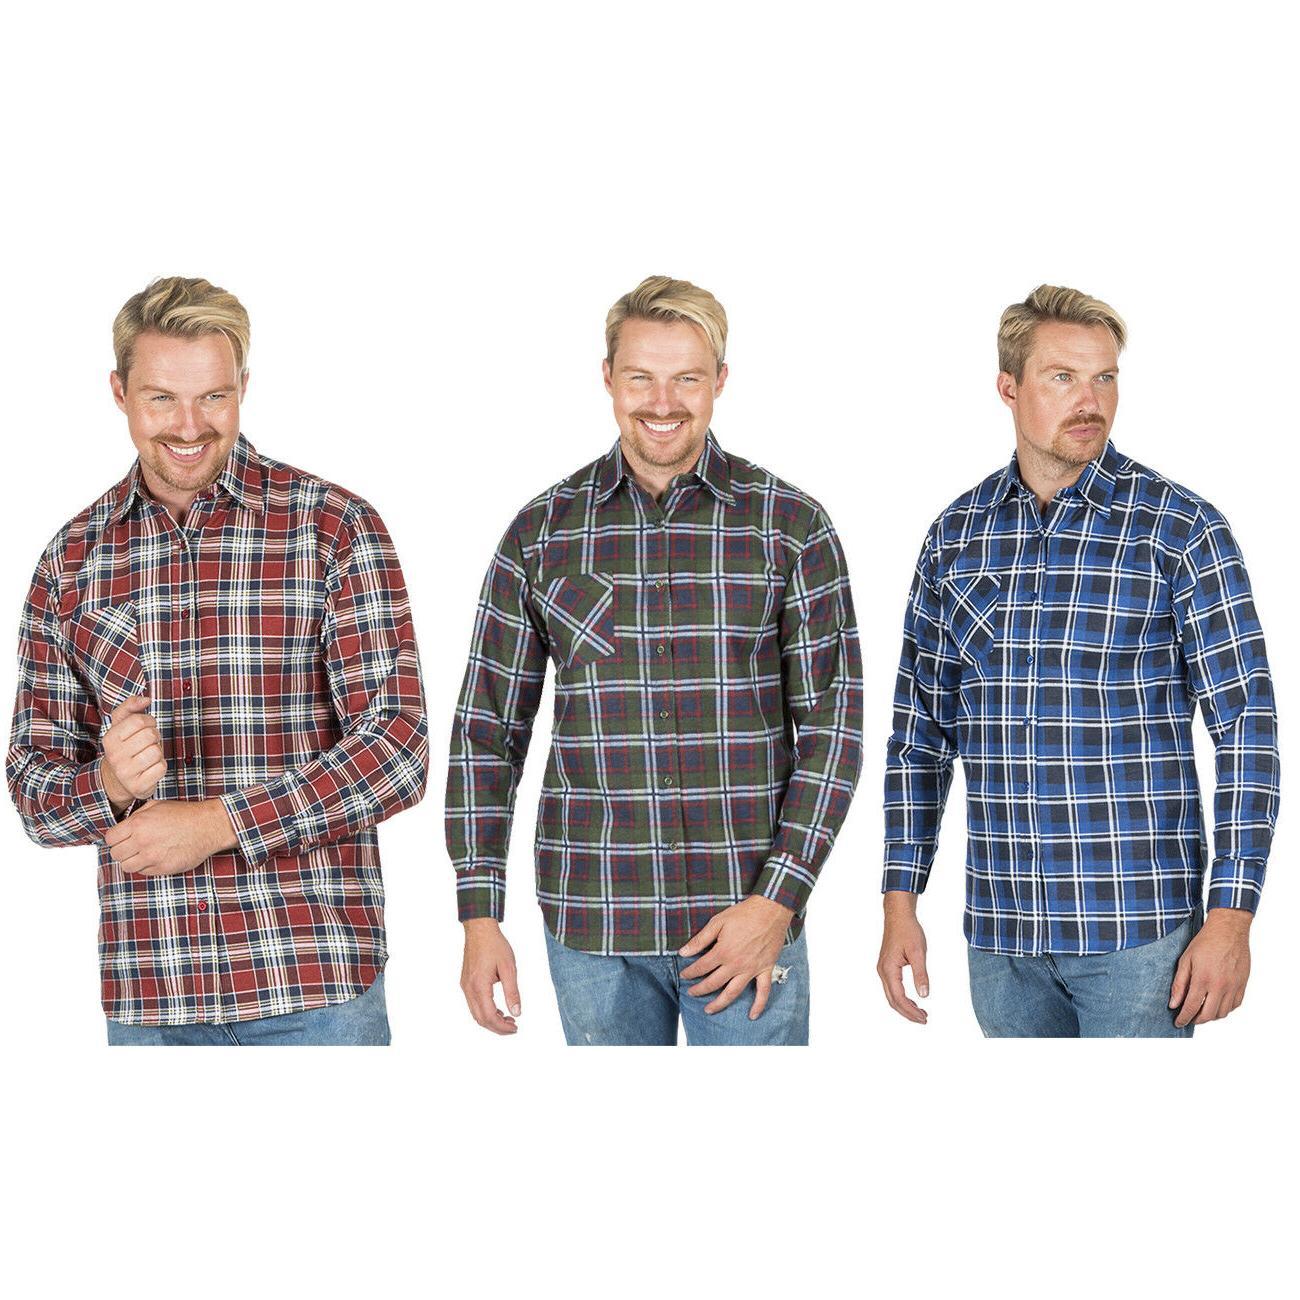 Warm Work Shirts Check Long